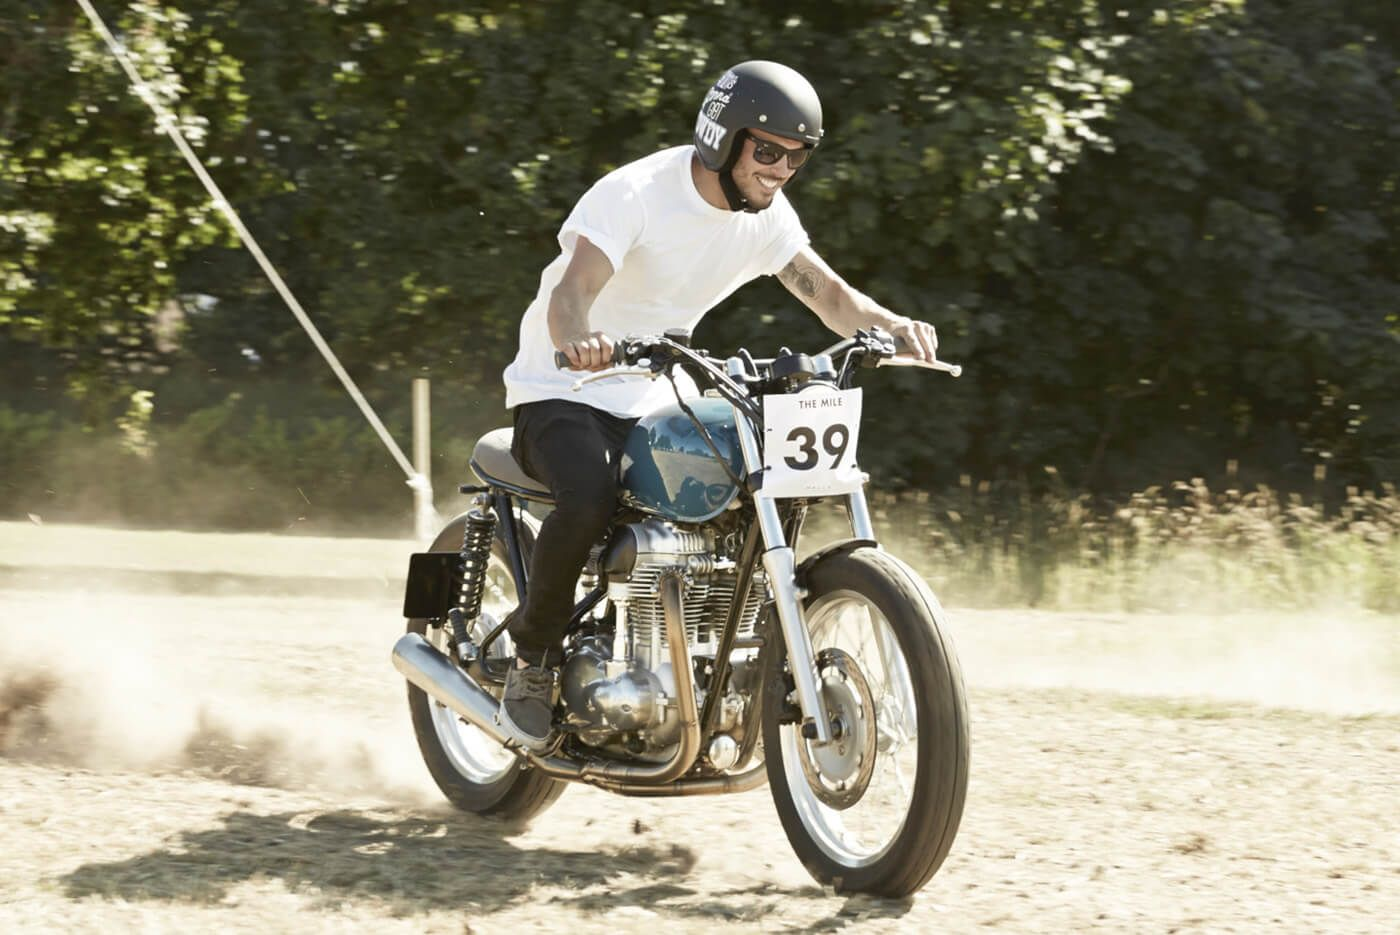 W650 Motocross Kawasaki W800Biker